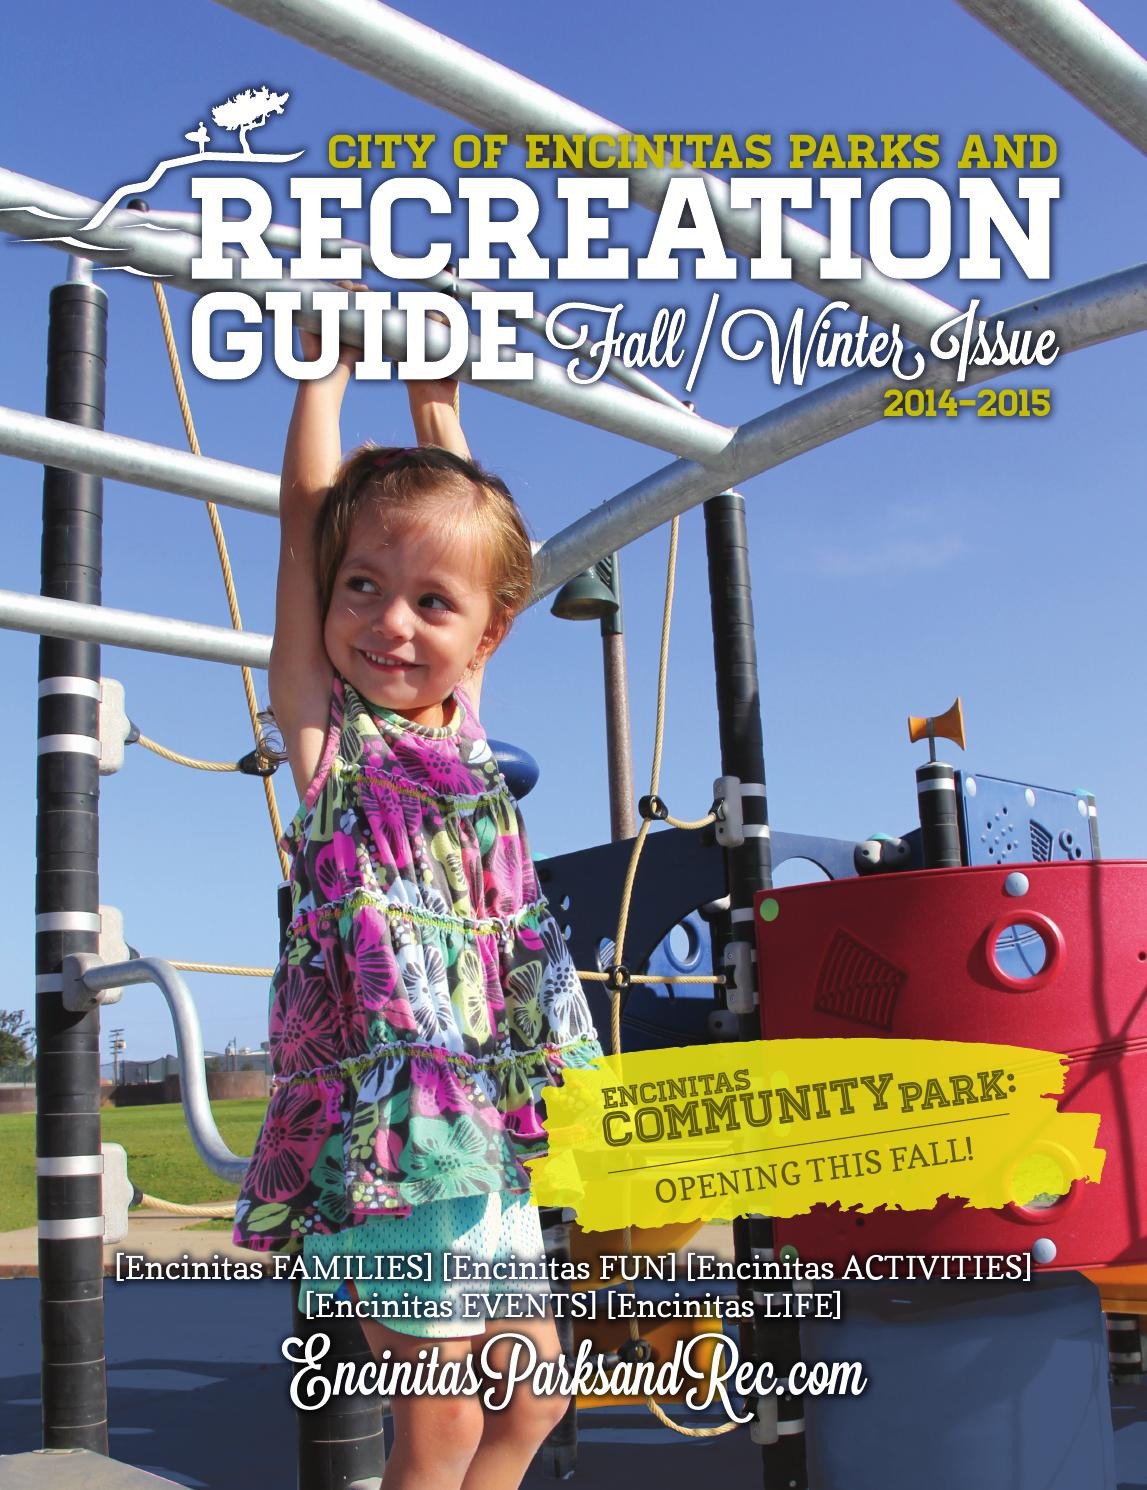 How to Register for Recreation Programs – City of Toronto